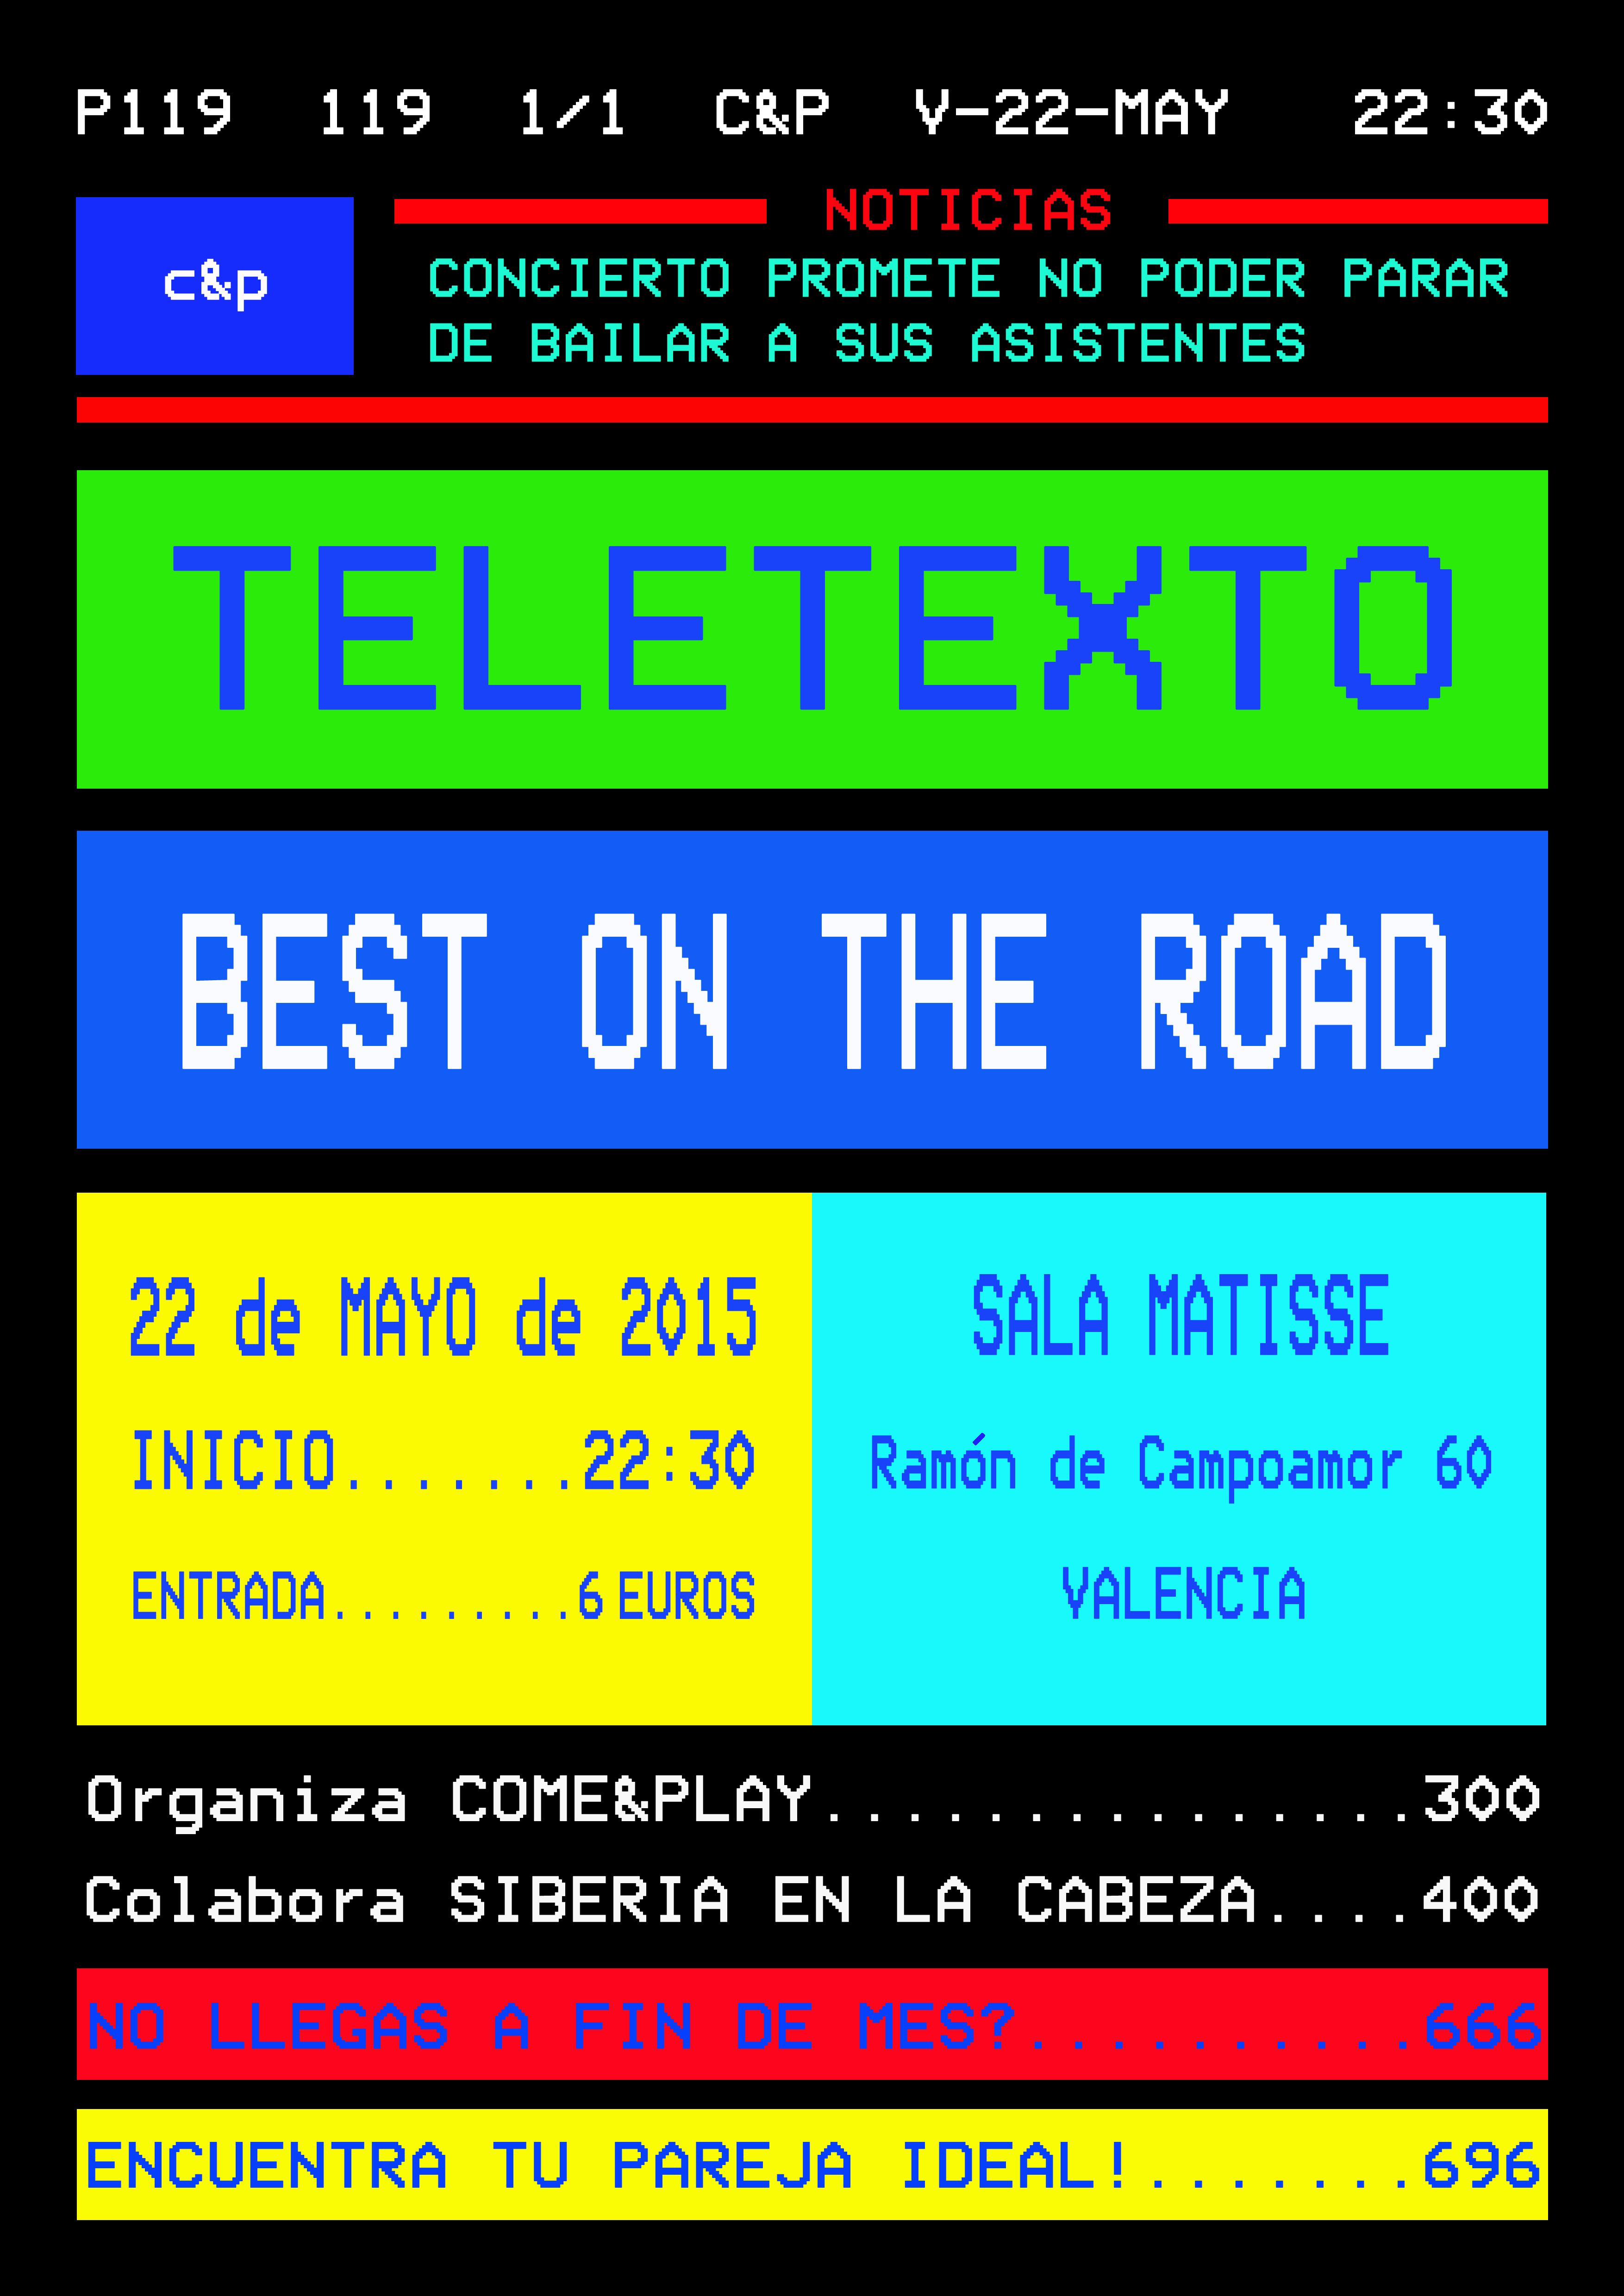 TELETEXTO + BEST ON THE ROAD